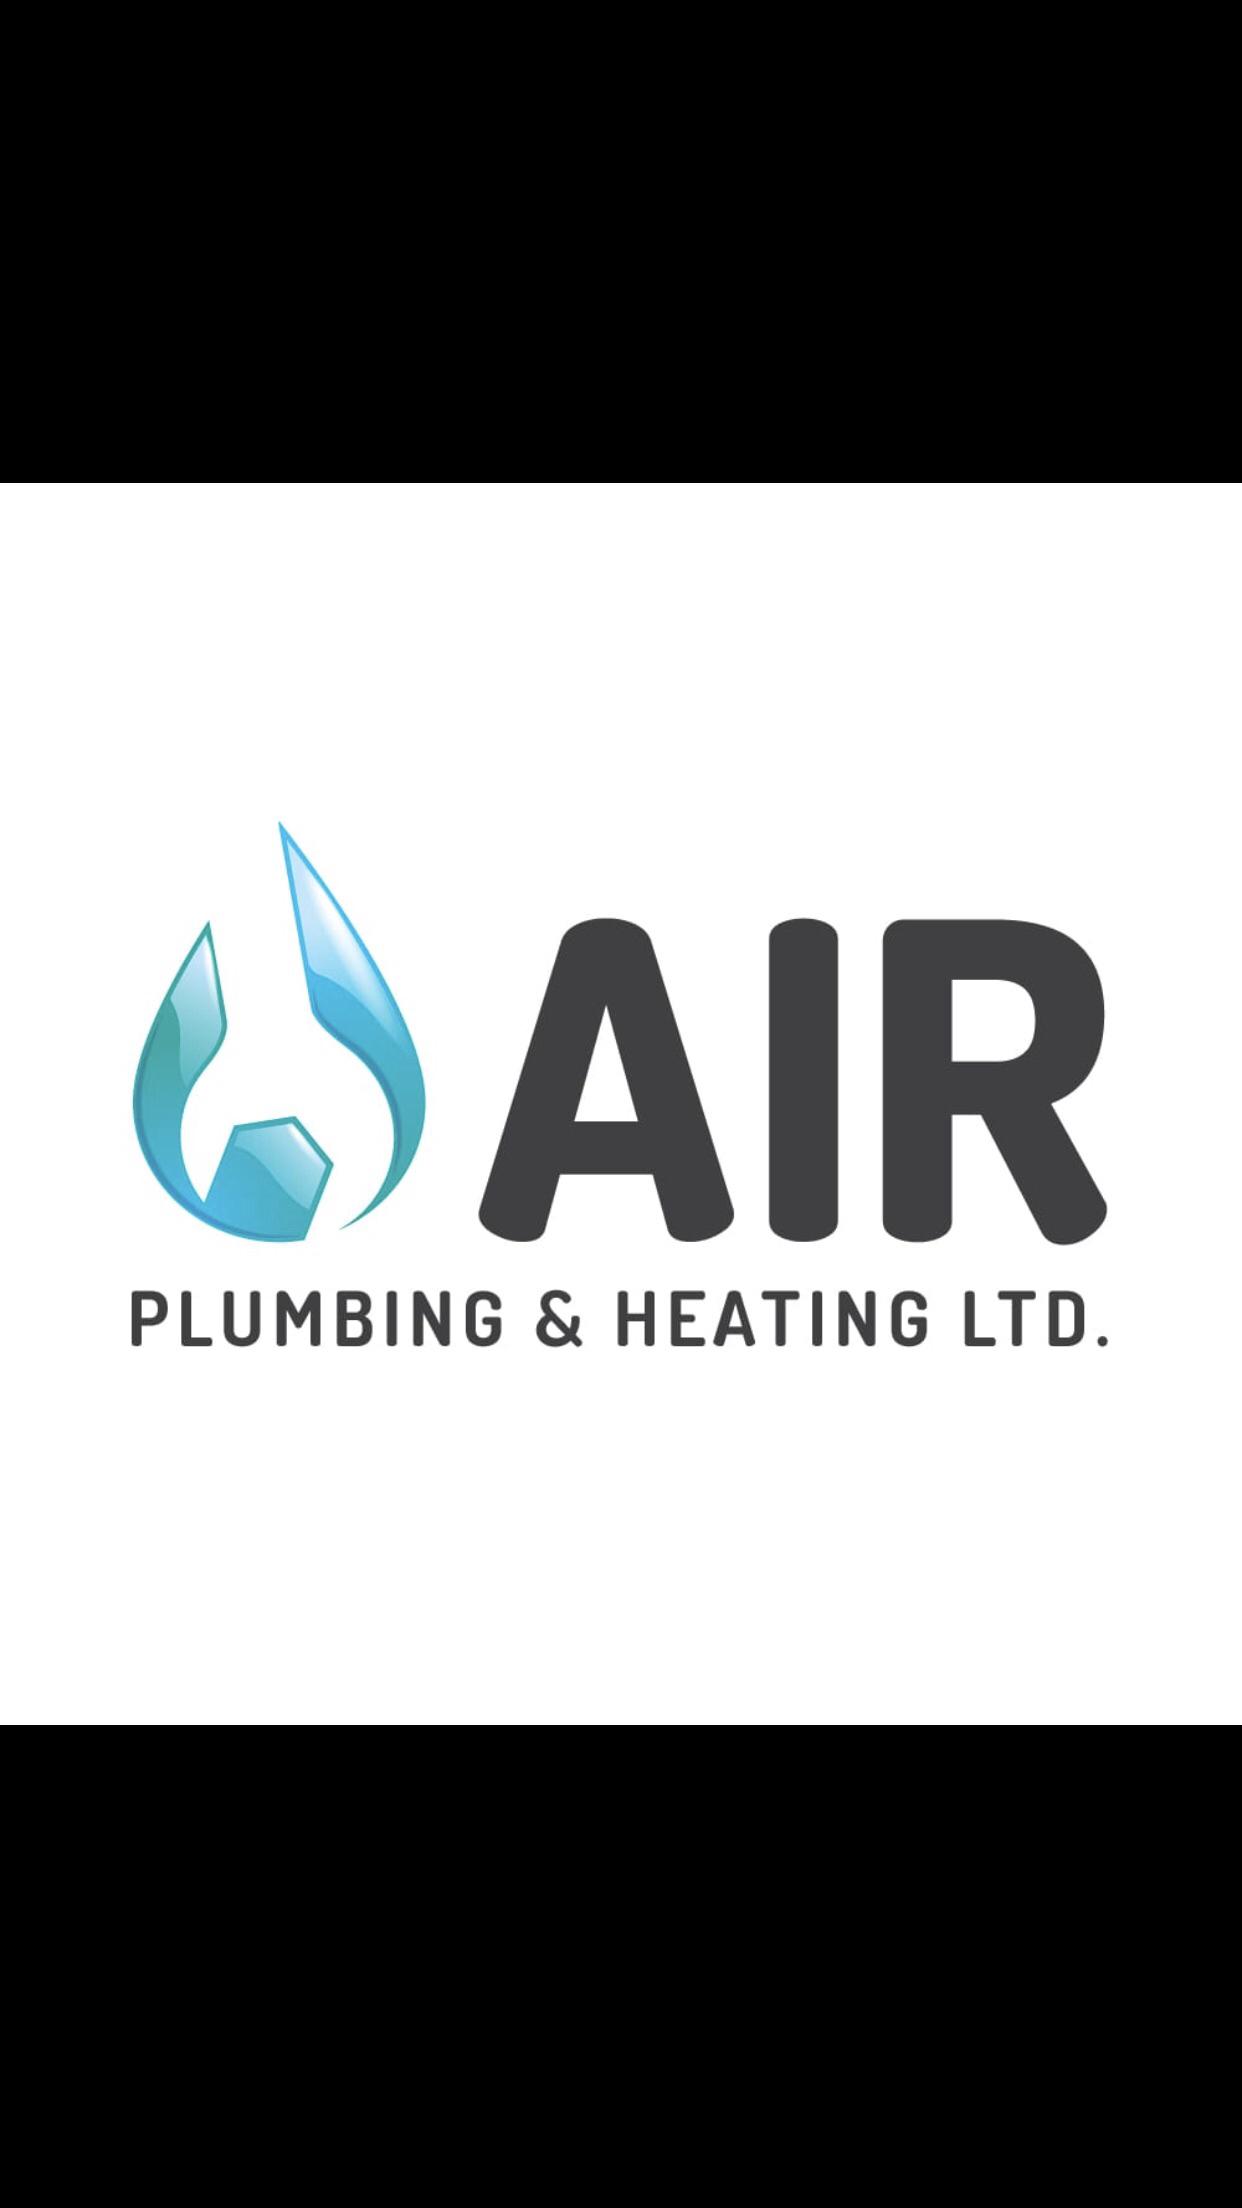 Air Plumbing & Heating Ltd Verified Logo